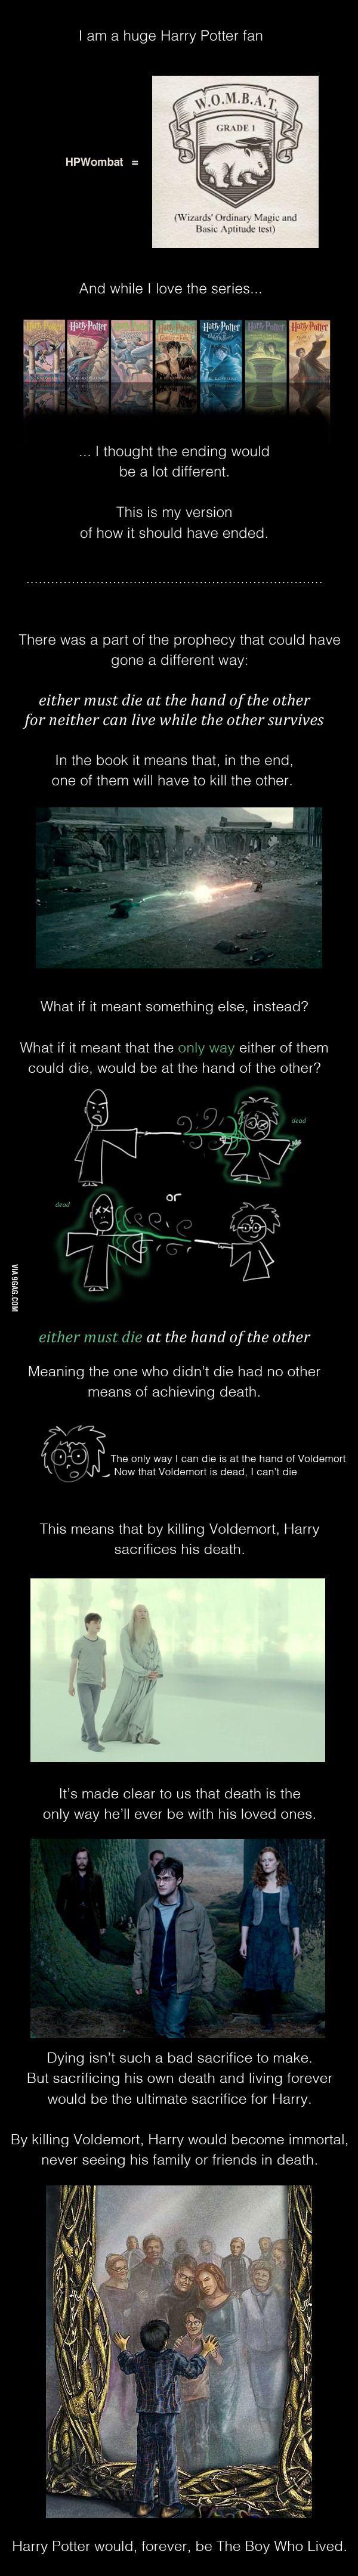 Haary Potter Geek - amazing theory! :O